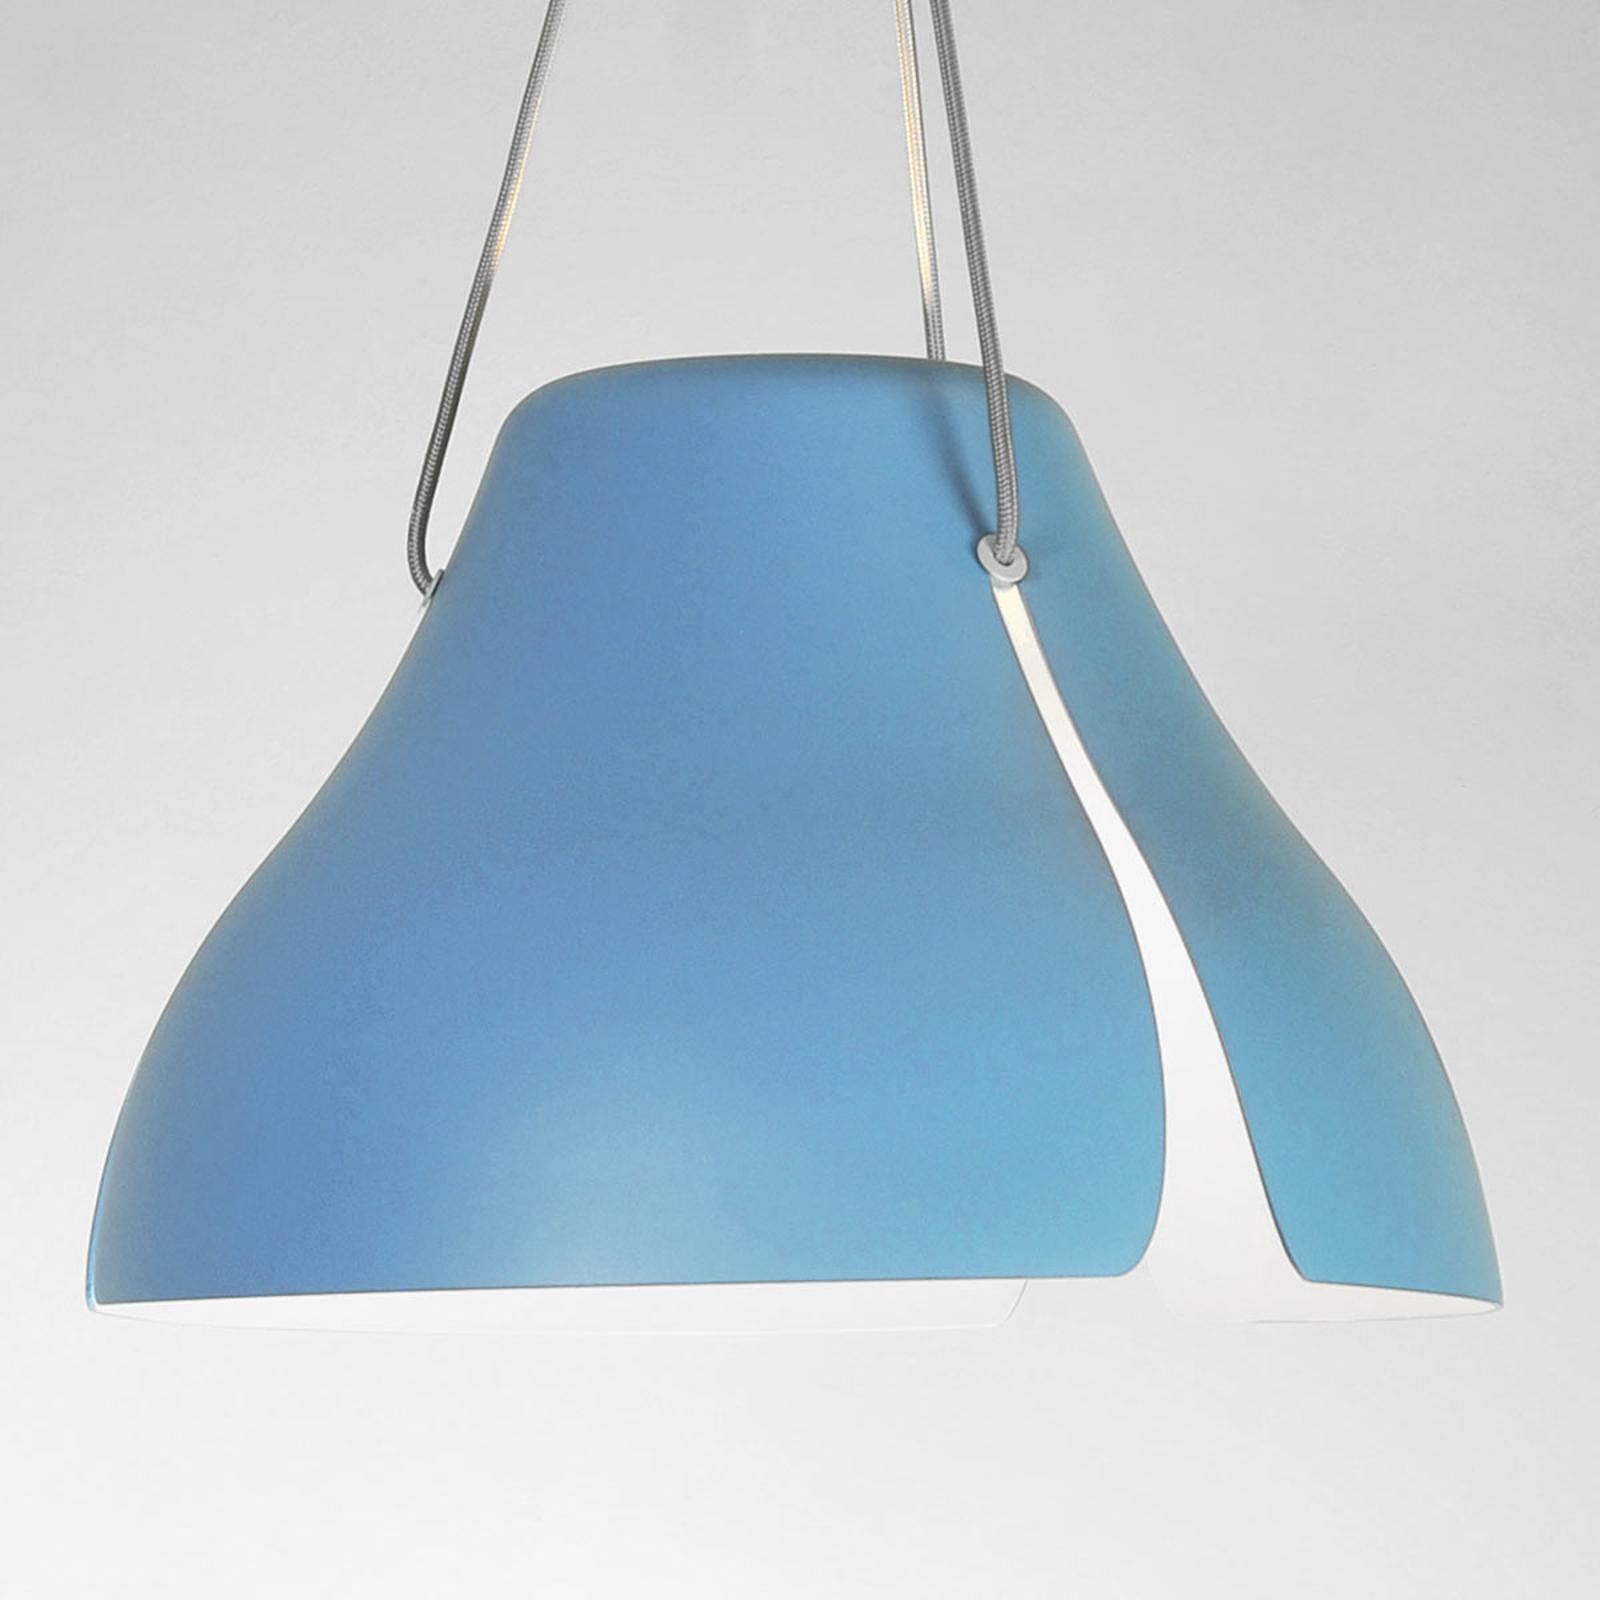 LED-Pendellampe Ginkgo S40 40 cm blau